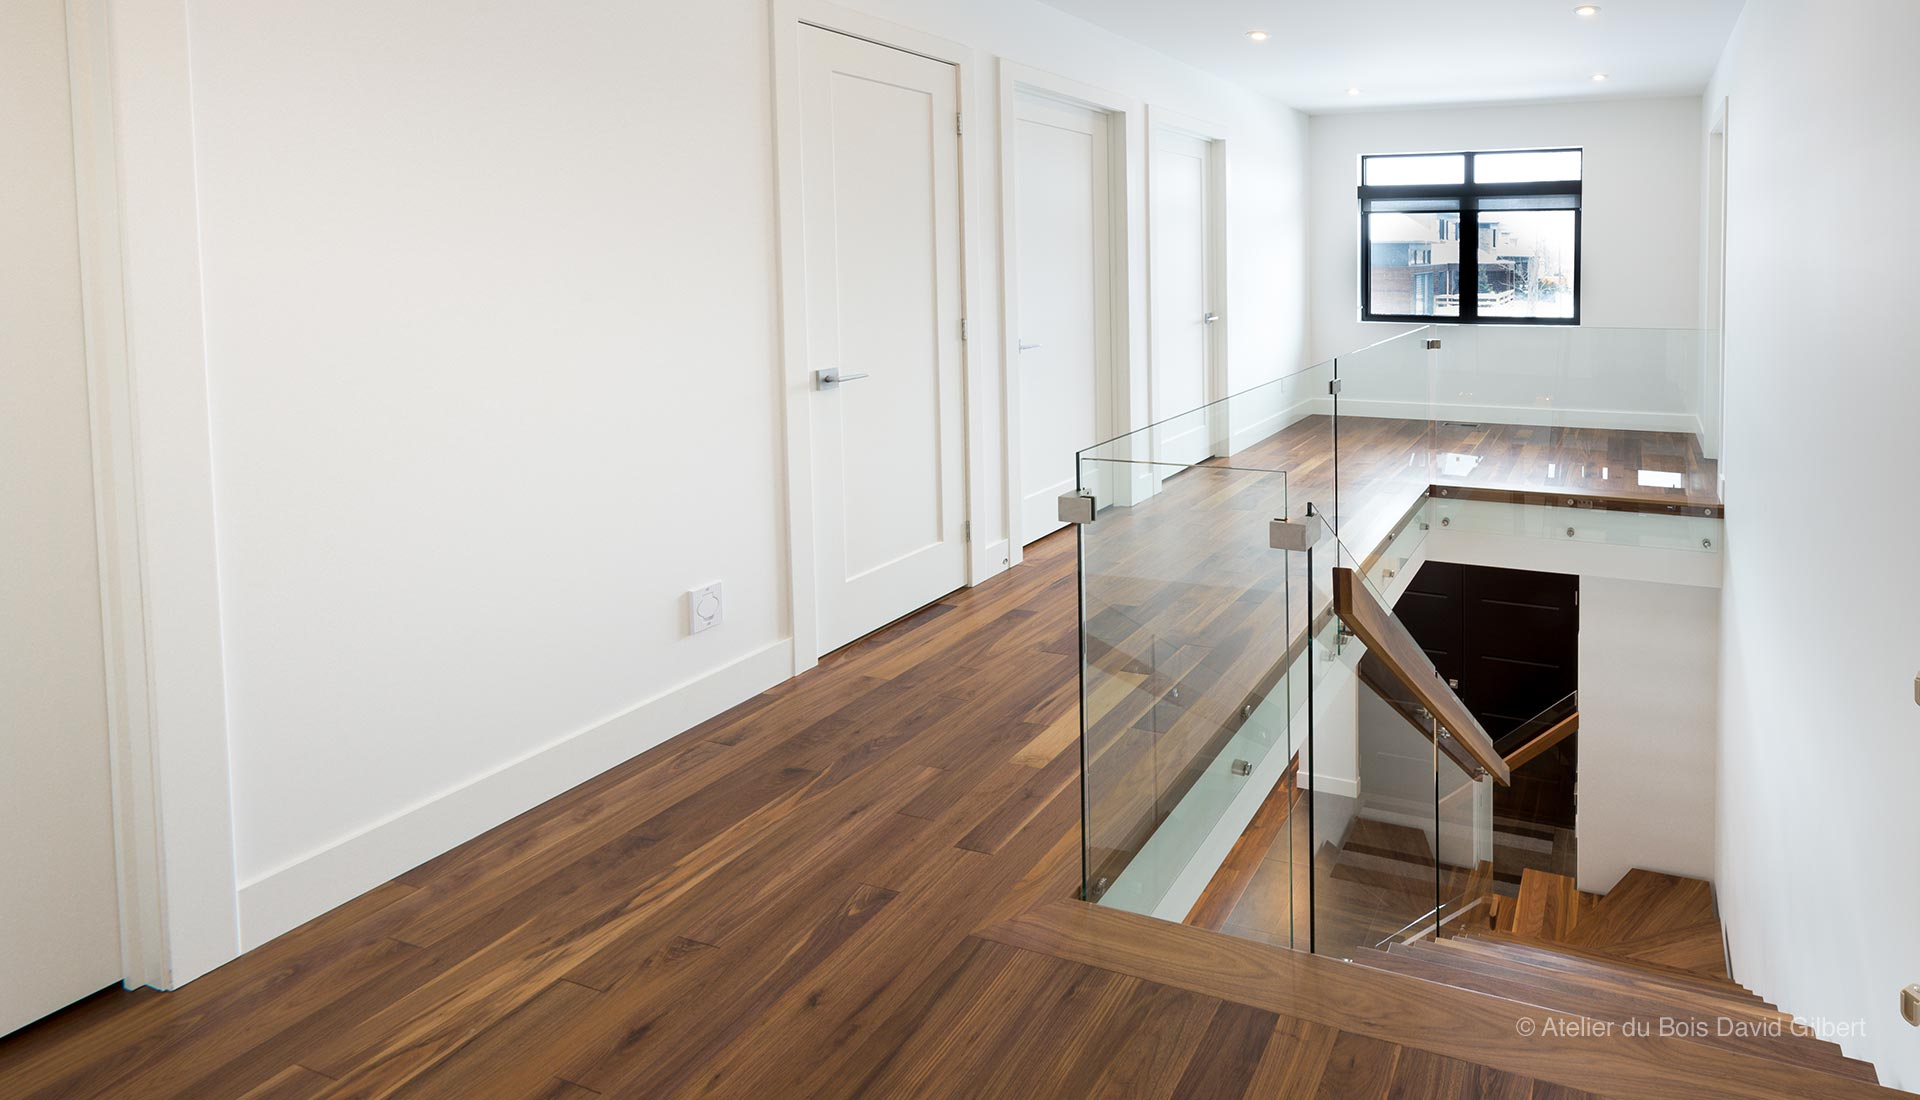 renover un escalier en bois vernis. Black Bedroom Furniture Sets. Home Design Ideas